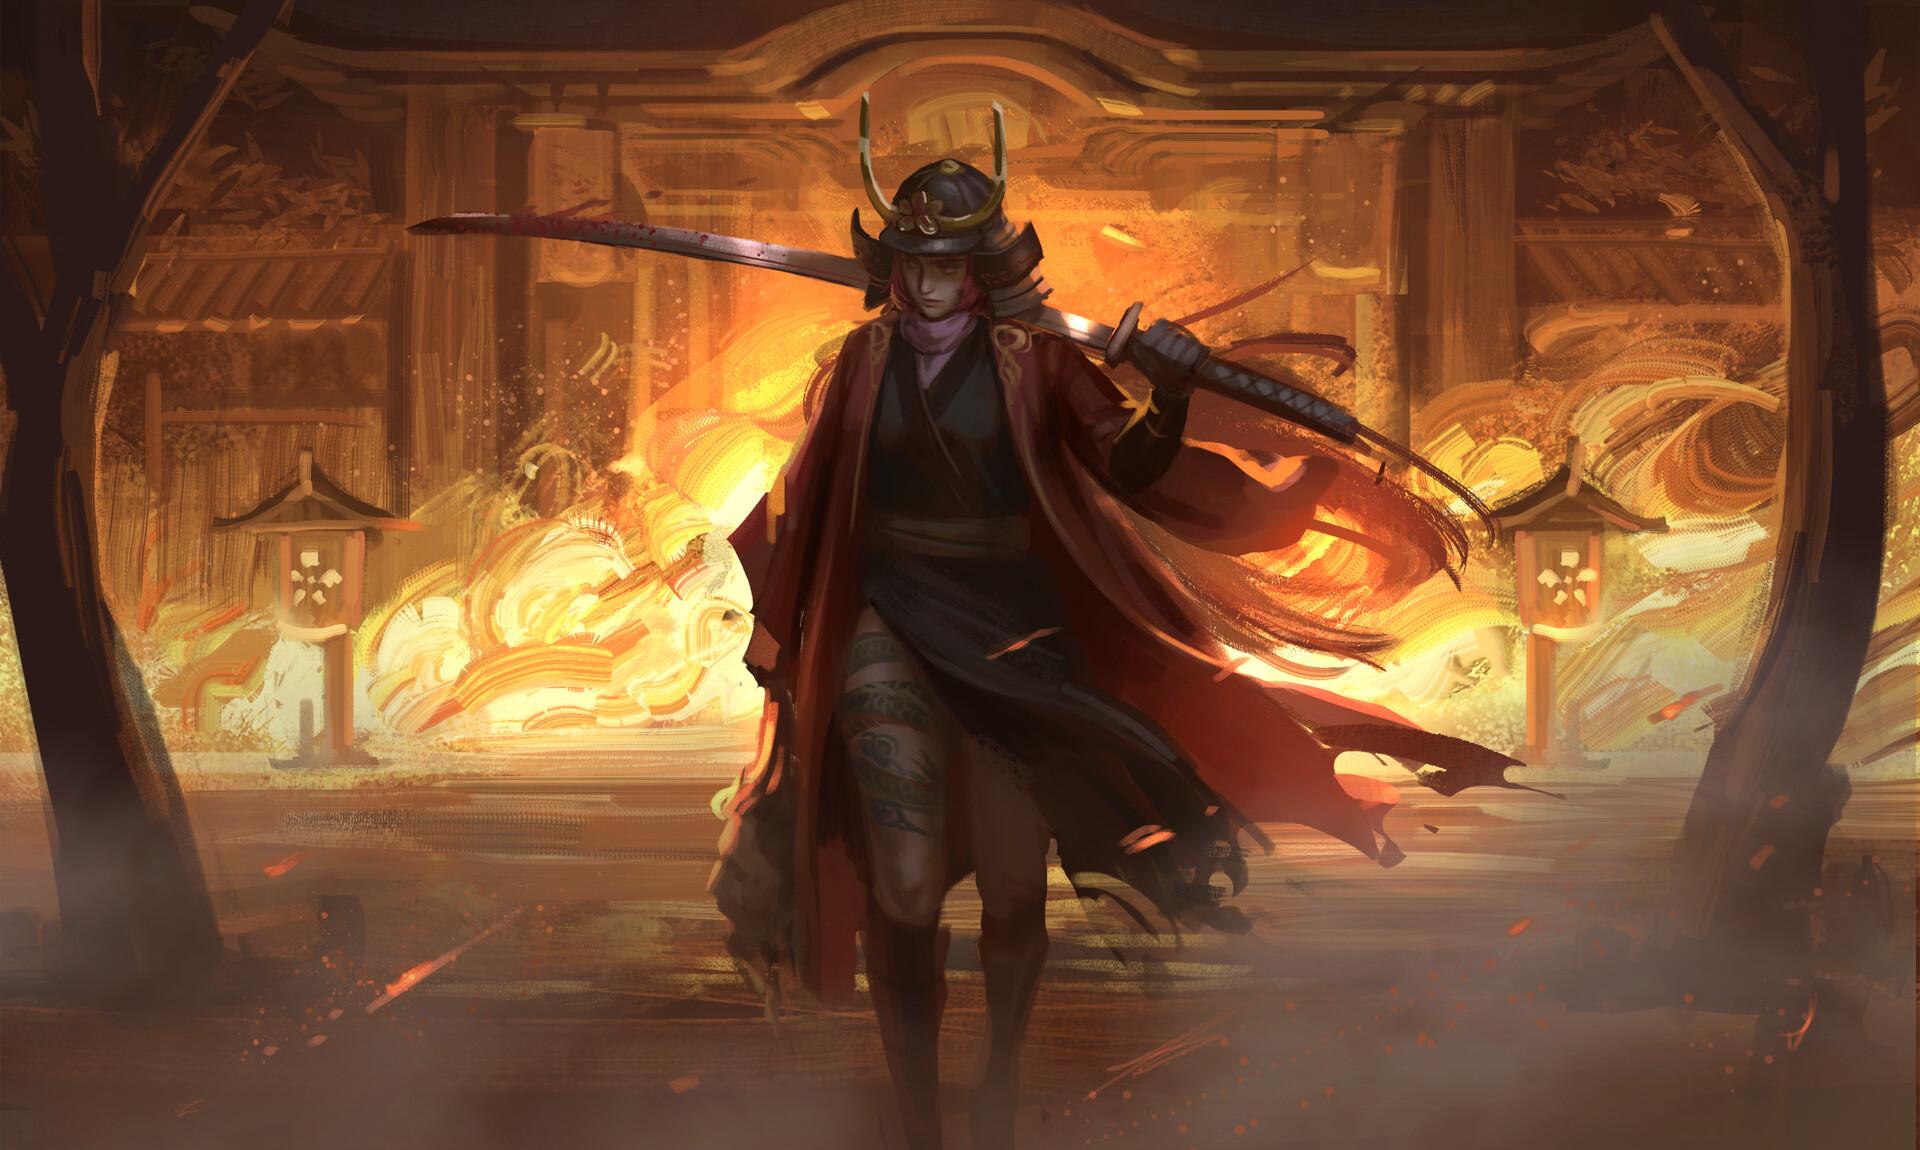 General 1920x1150 samurai fire odachi katana blood fantasy art tattoo women head trees gates beheading